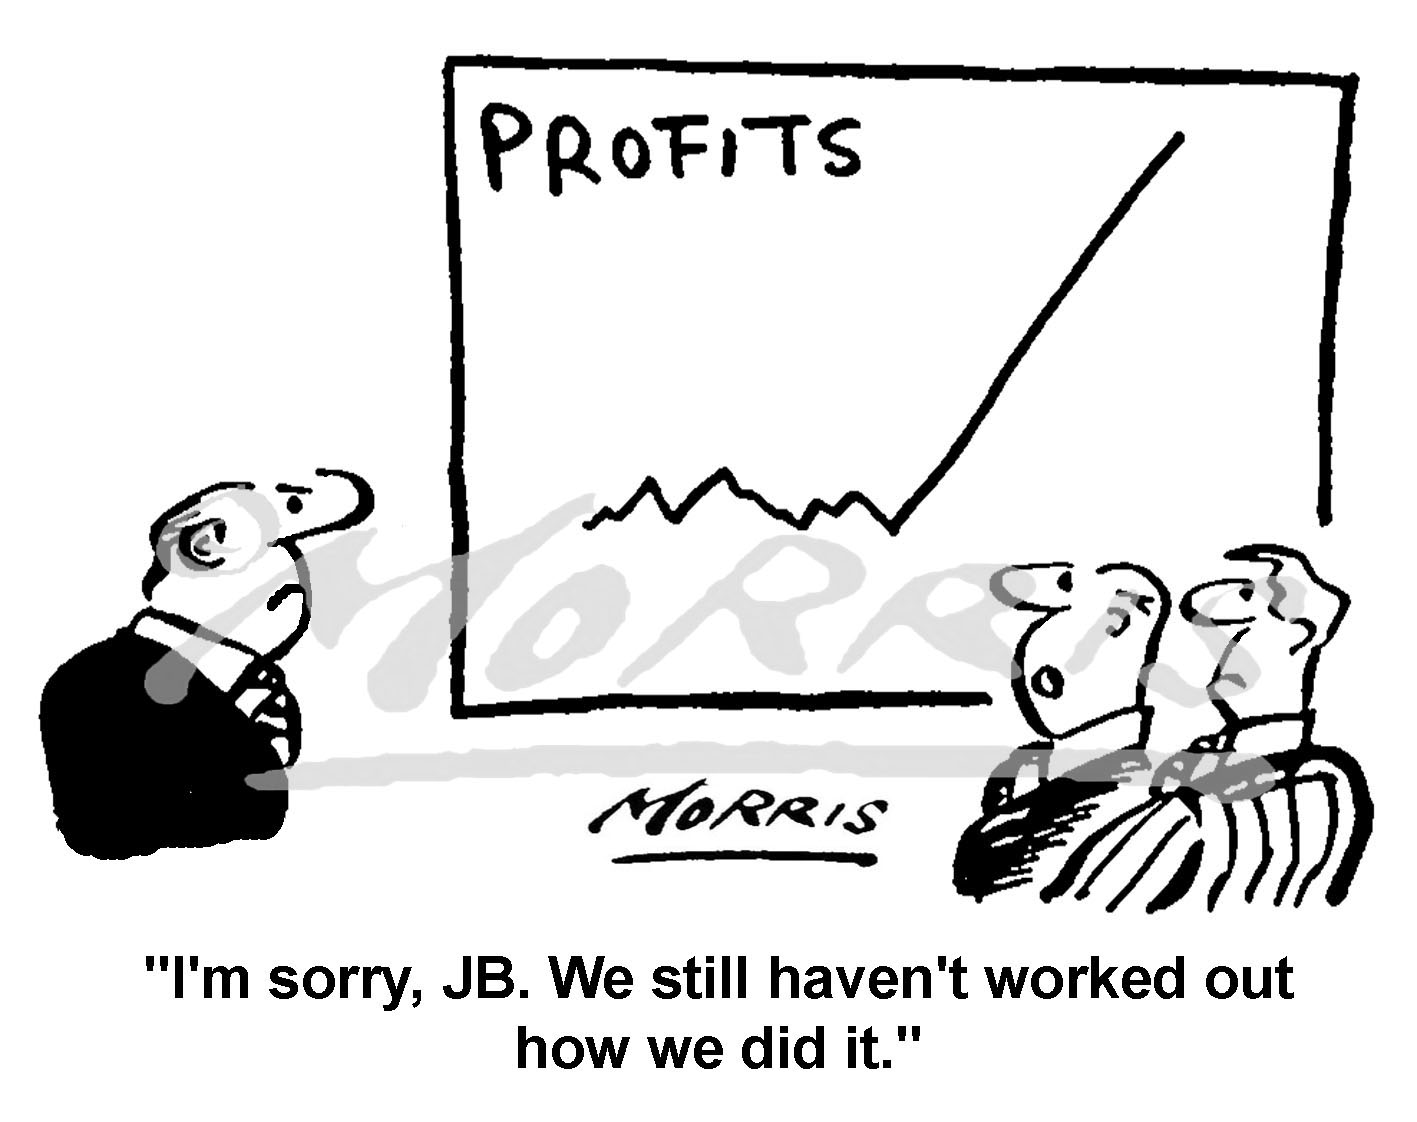 Profits graph cartoon Ref: 0475bw